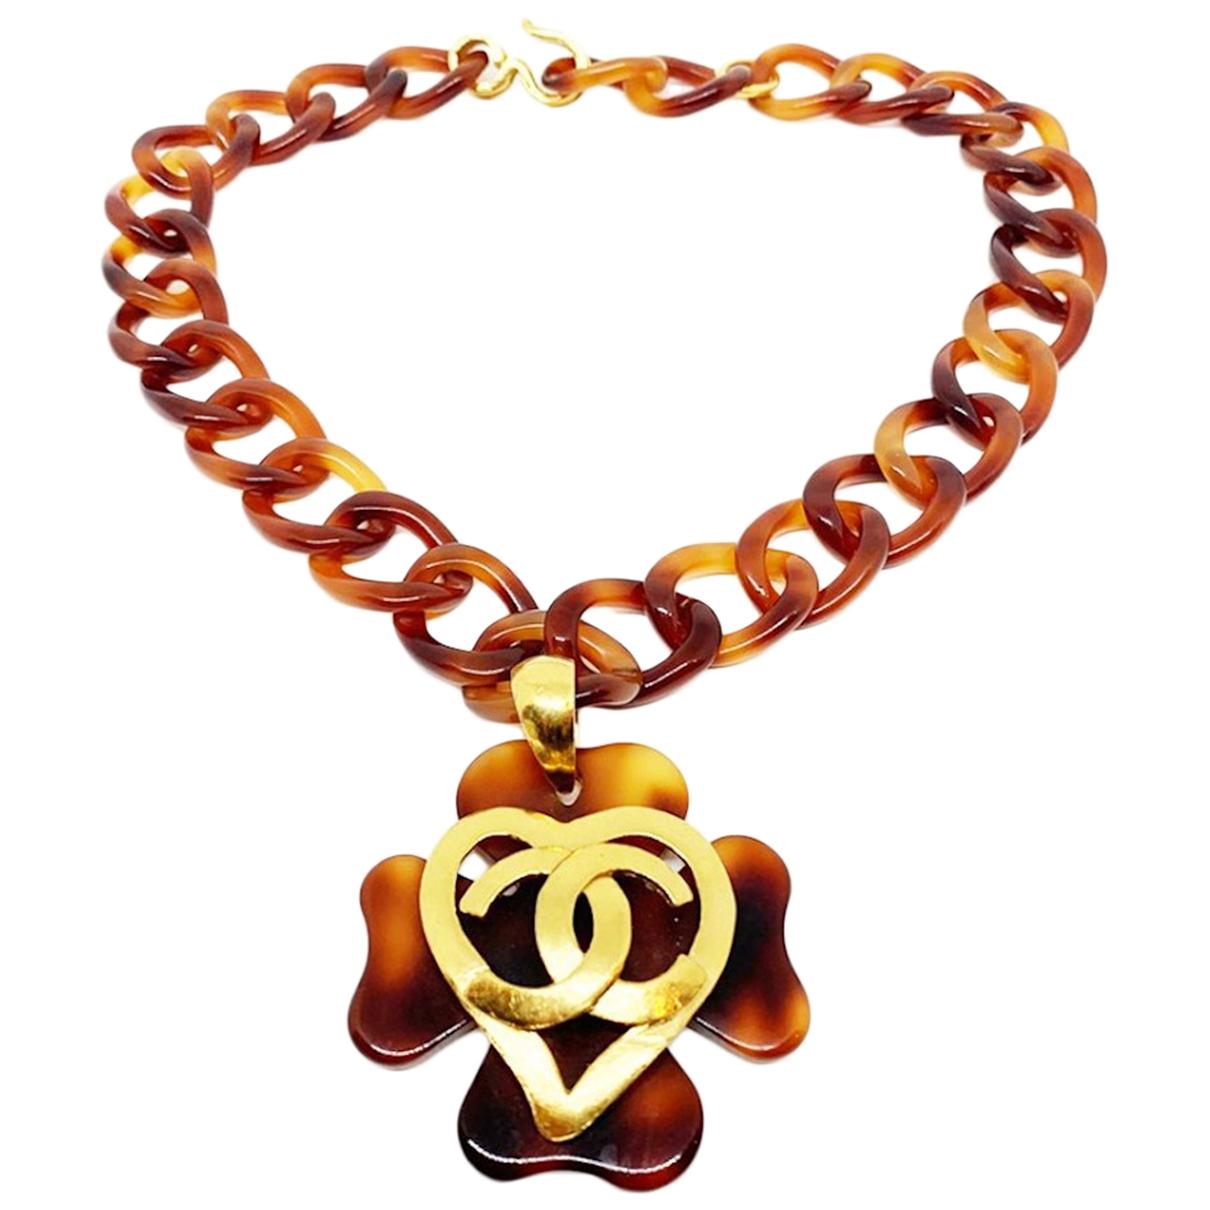 Chanel \N Kette in  Braun Metall